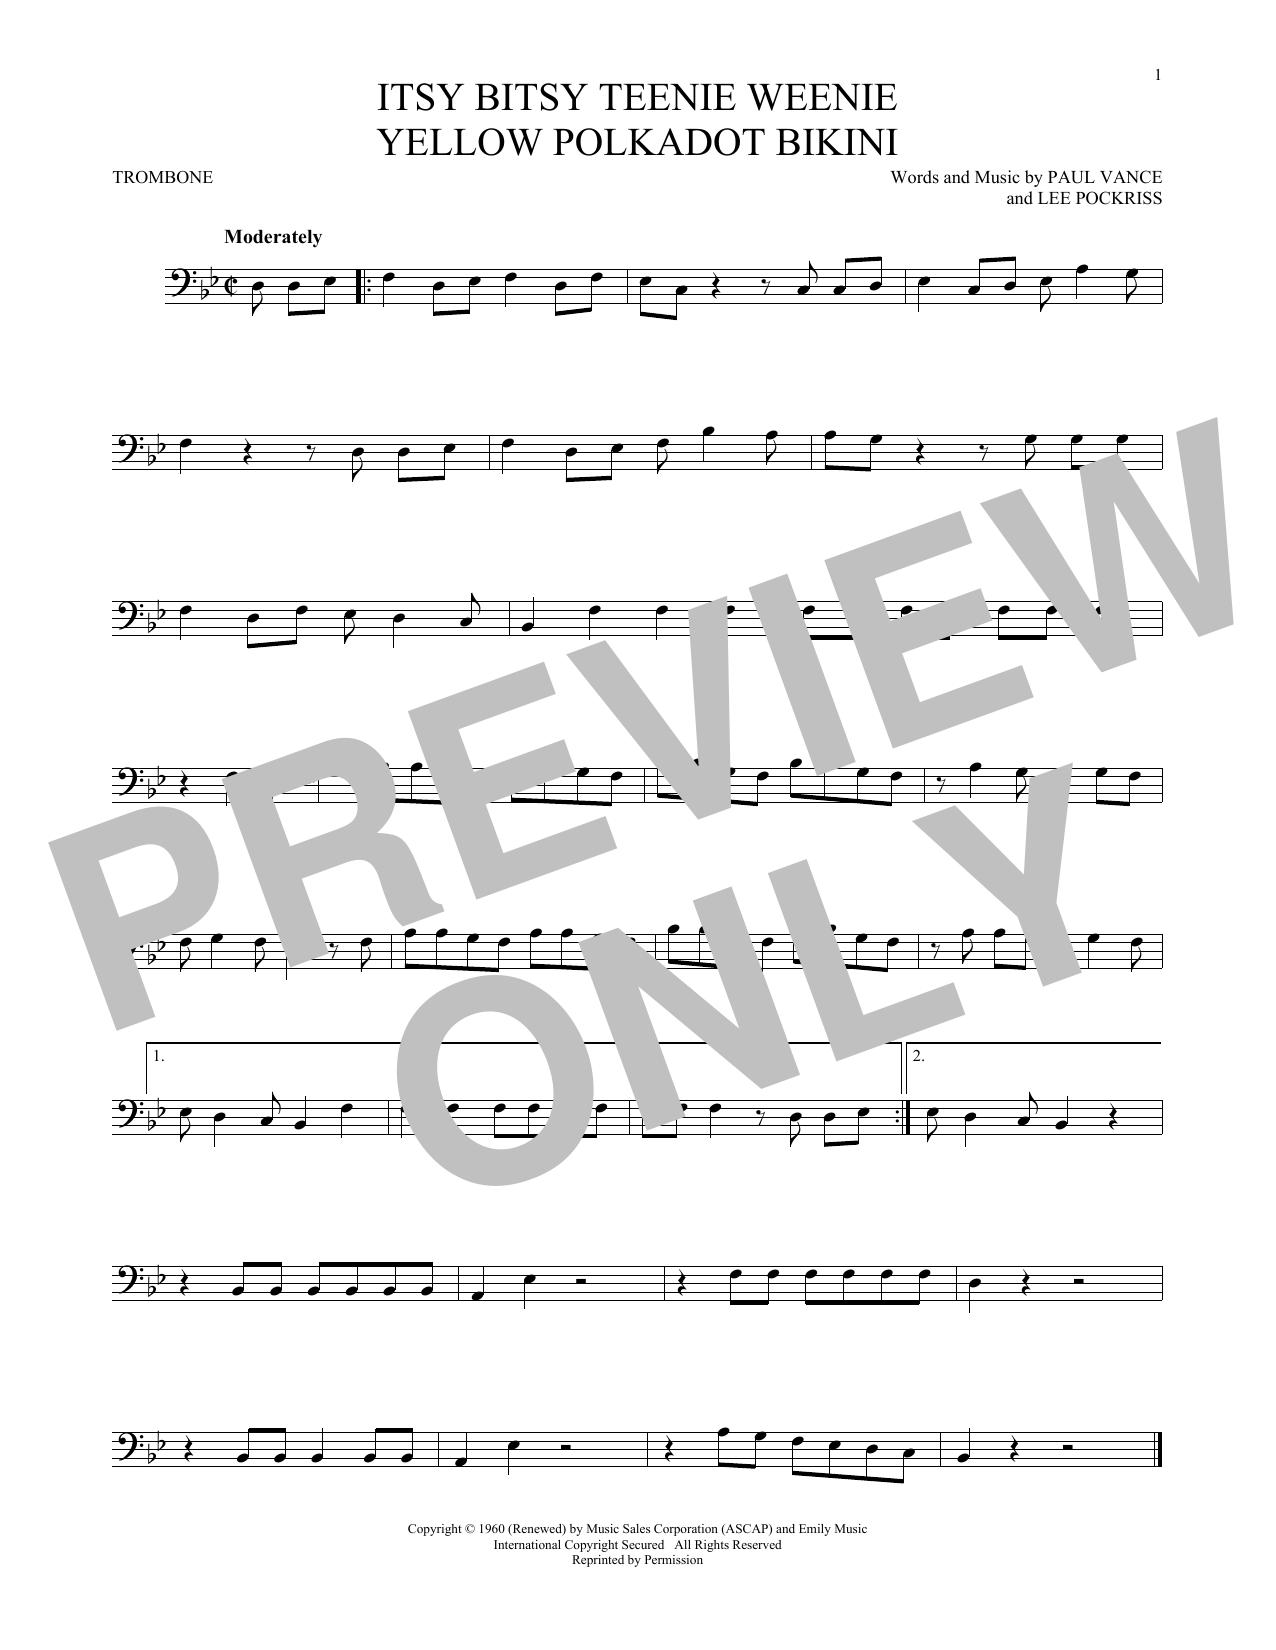 Itsy Bitsy Teenie Weenie Yellow Polkadot Bikini (Trombone Solo)